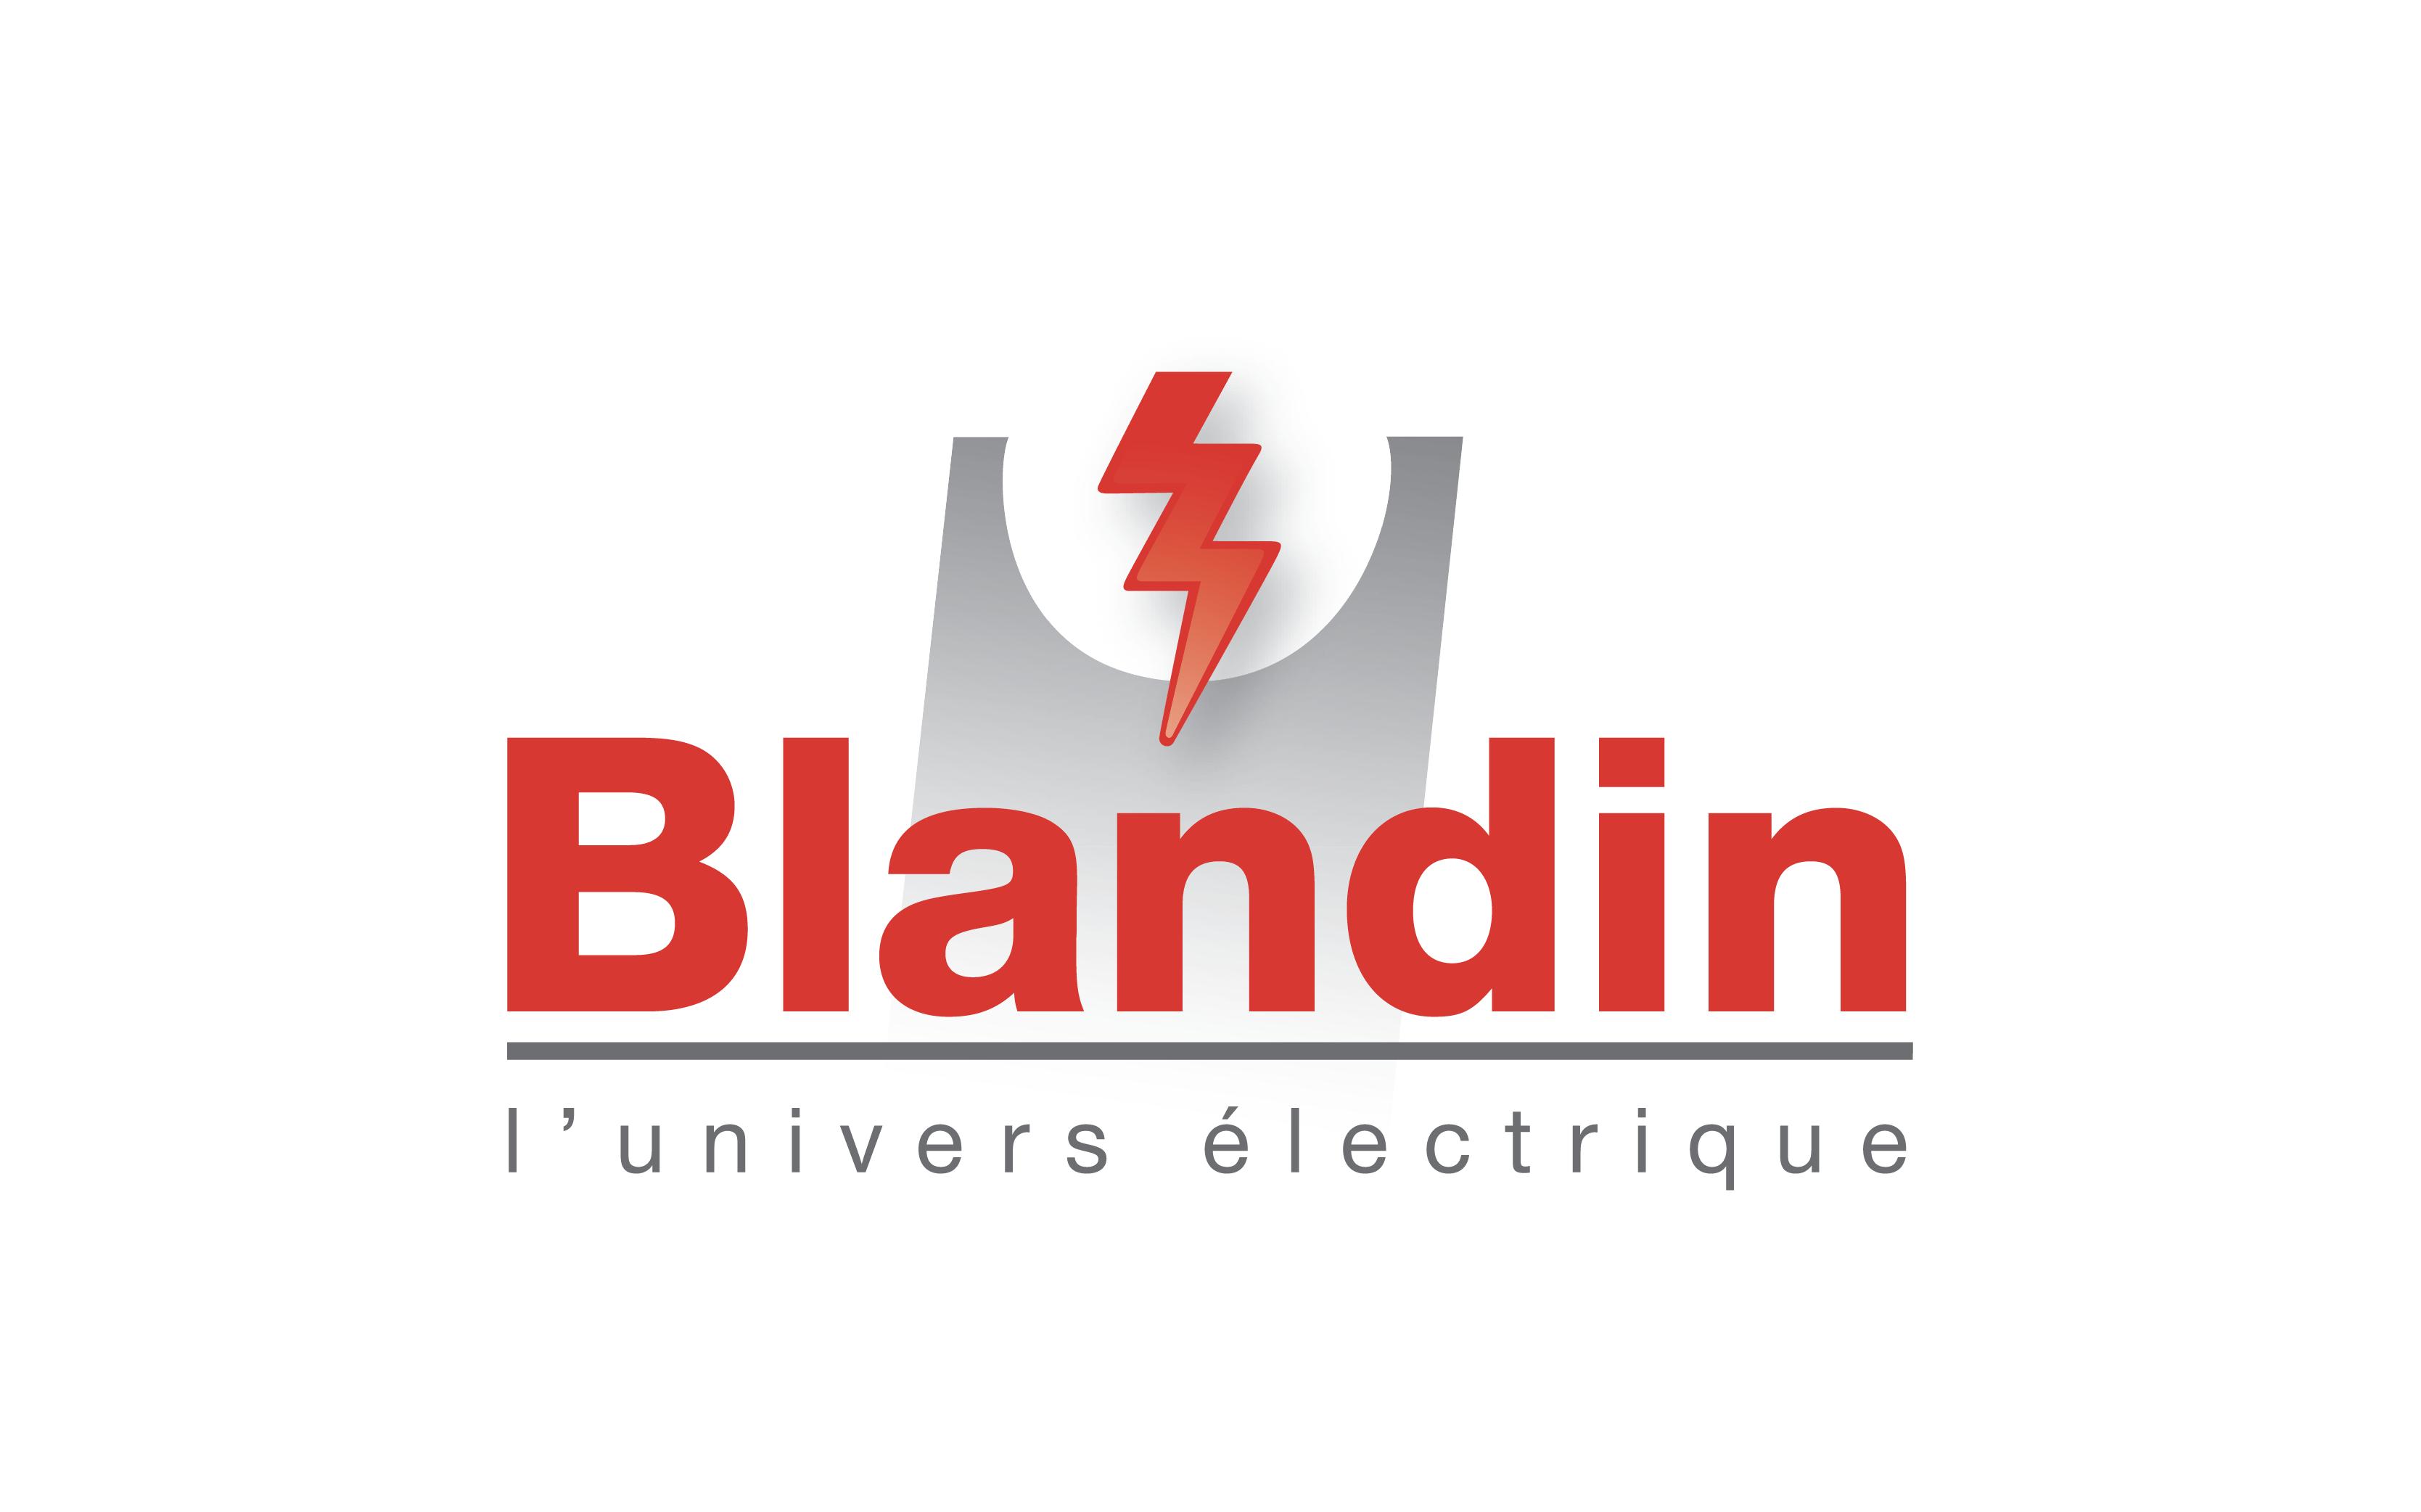 BLANDIN-01.png